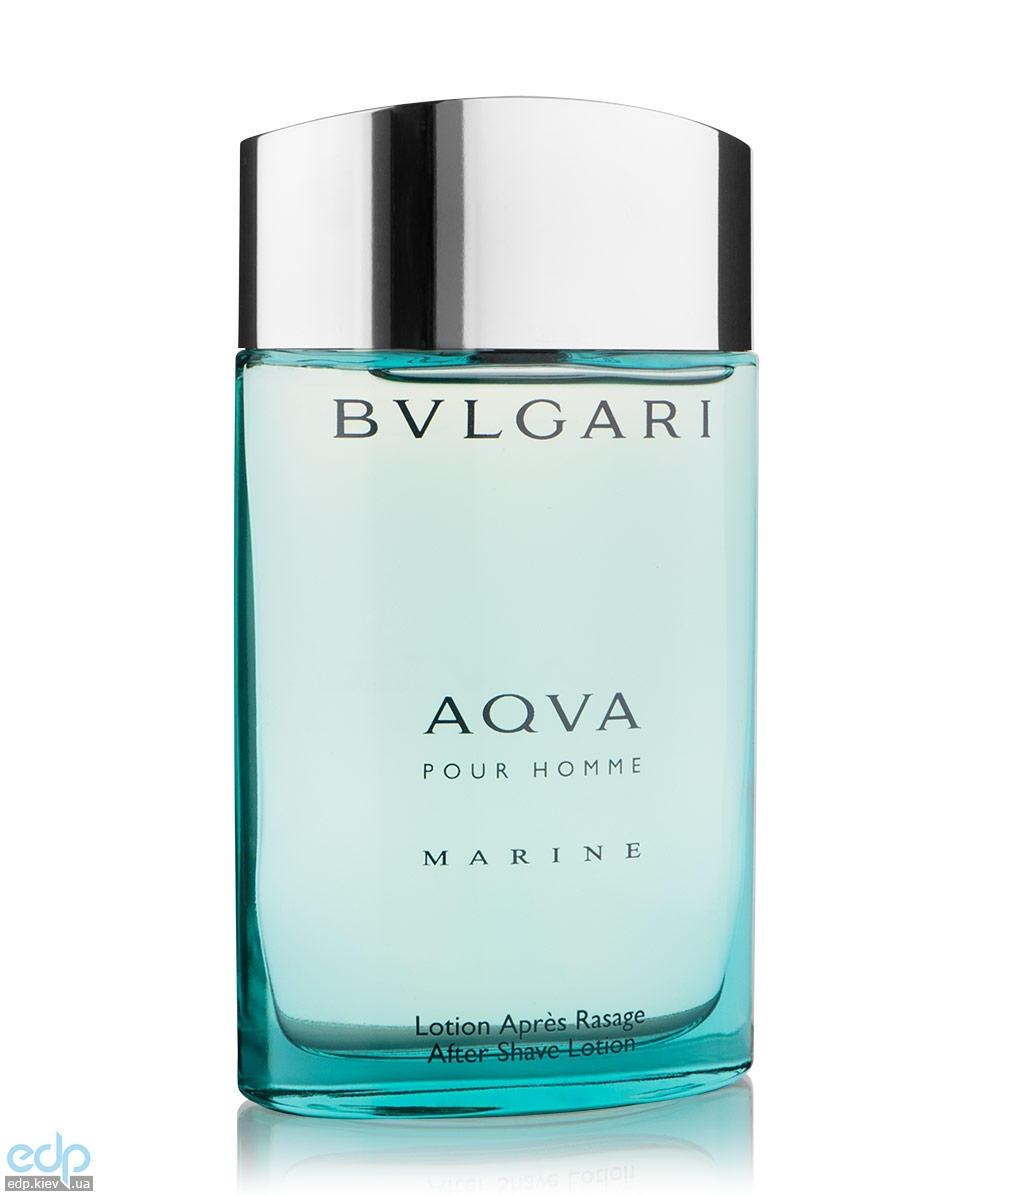 Bvlgari Aqva Pour Homme Marine - лосьон после бритья - 100 ml